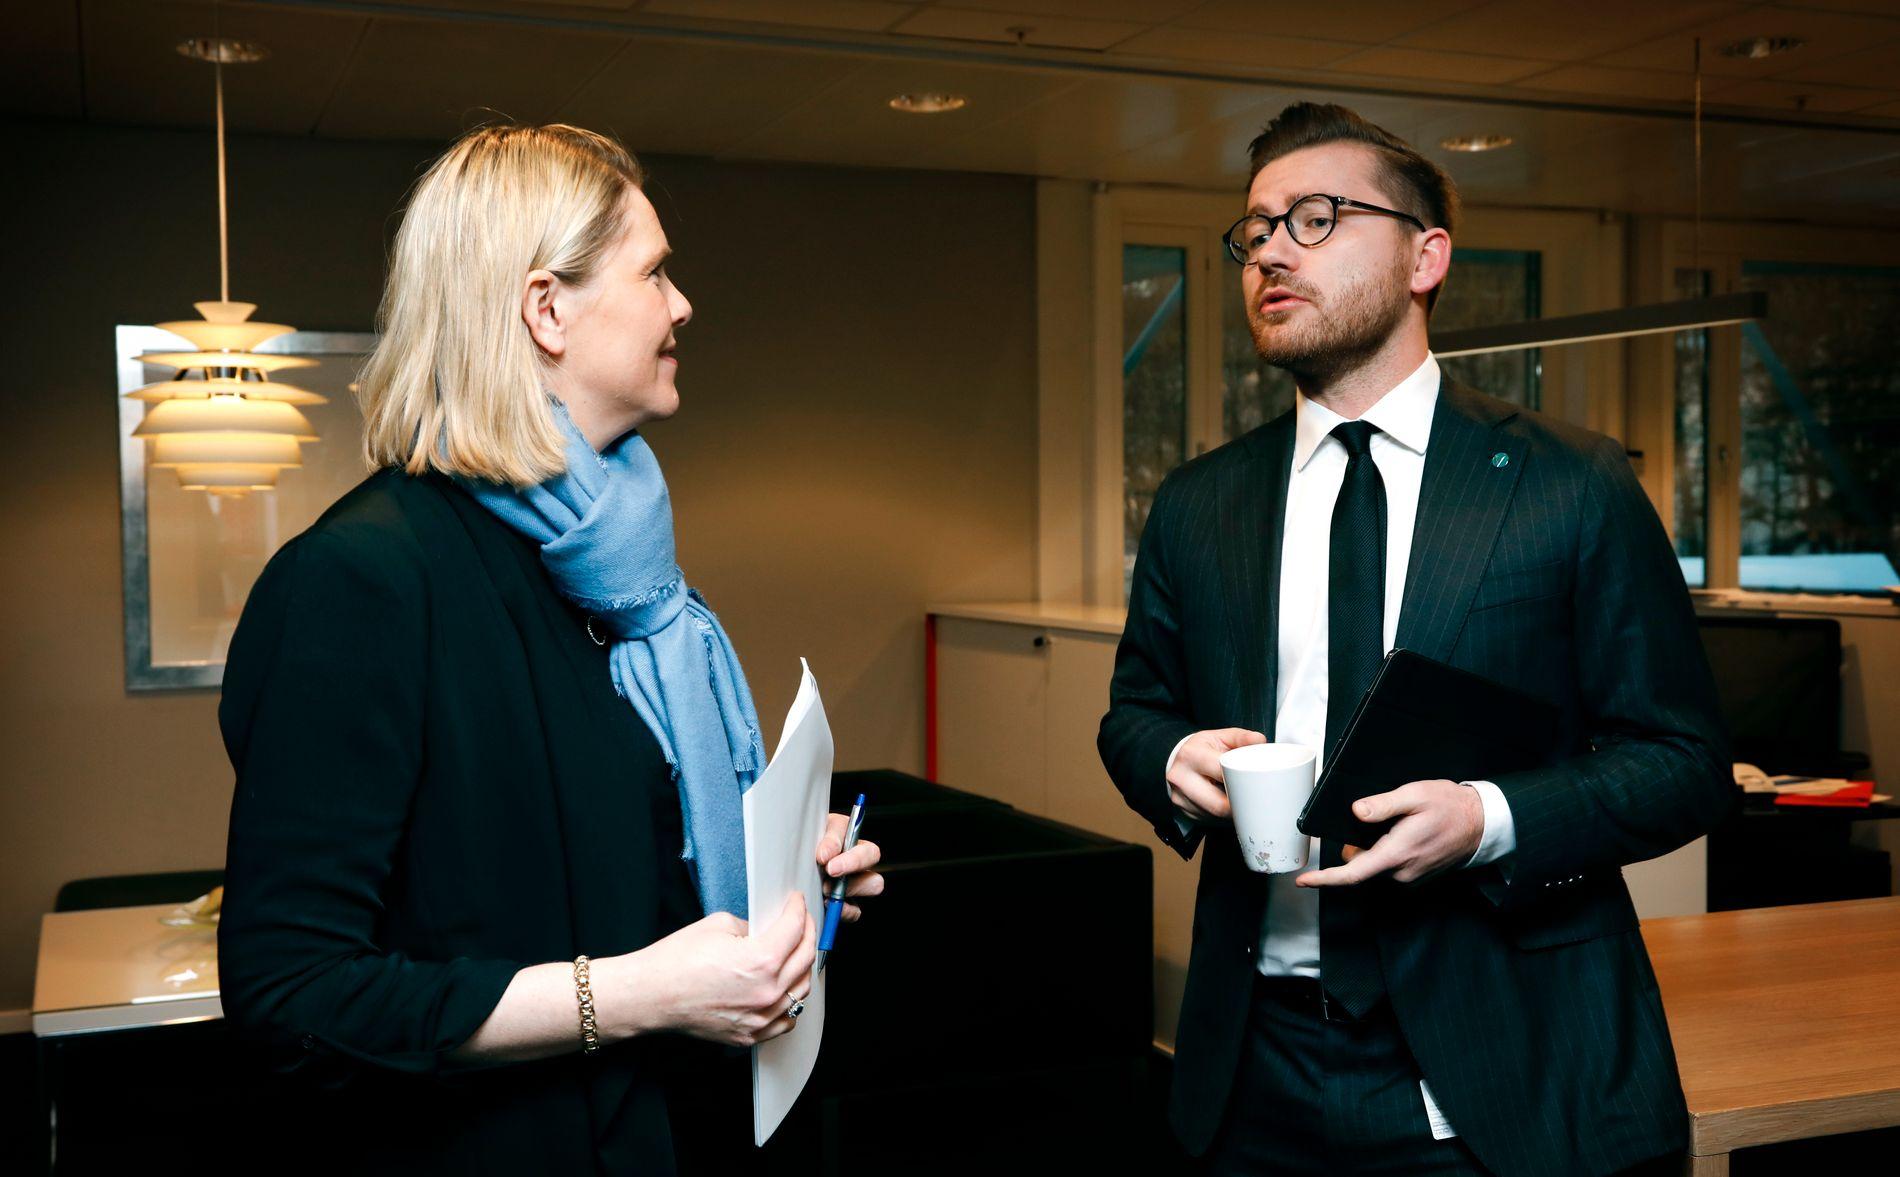 KRONPRINS: Sveinung Rotevatn er i dag Venstres statssekretær i Justis- og beredskapsdepartementet, og er tippa som ein favoritt til endå større oppgåver i framtida. Her er han med tidlegare justisminister Sylvi Listhaug (Frp).